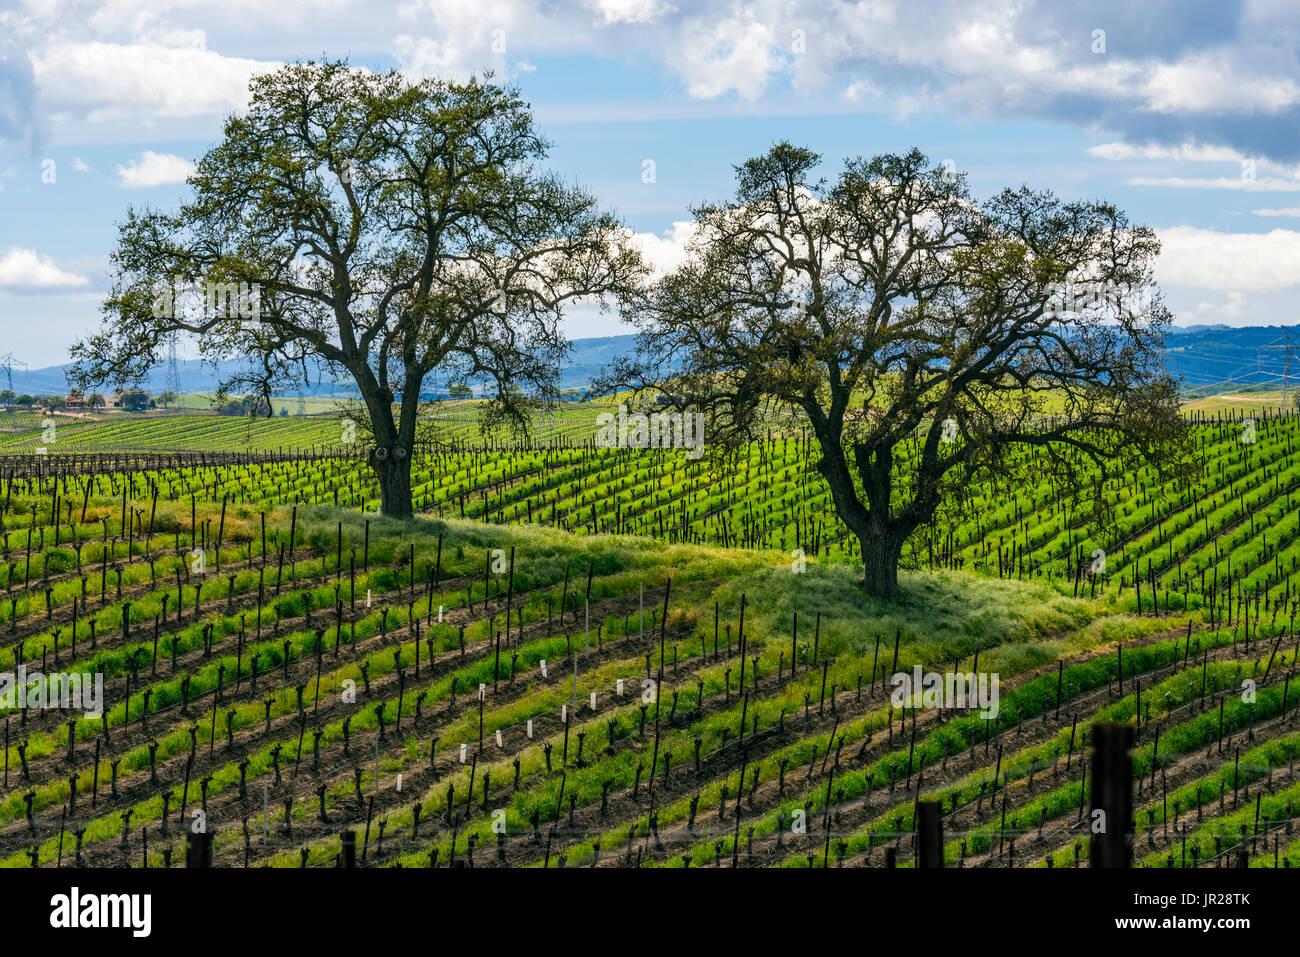 Vineyard, Paso Robles, California - Stock Image